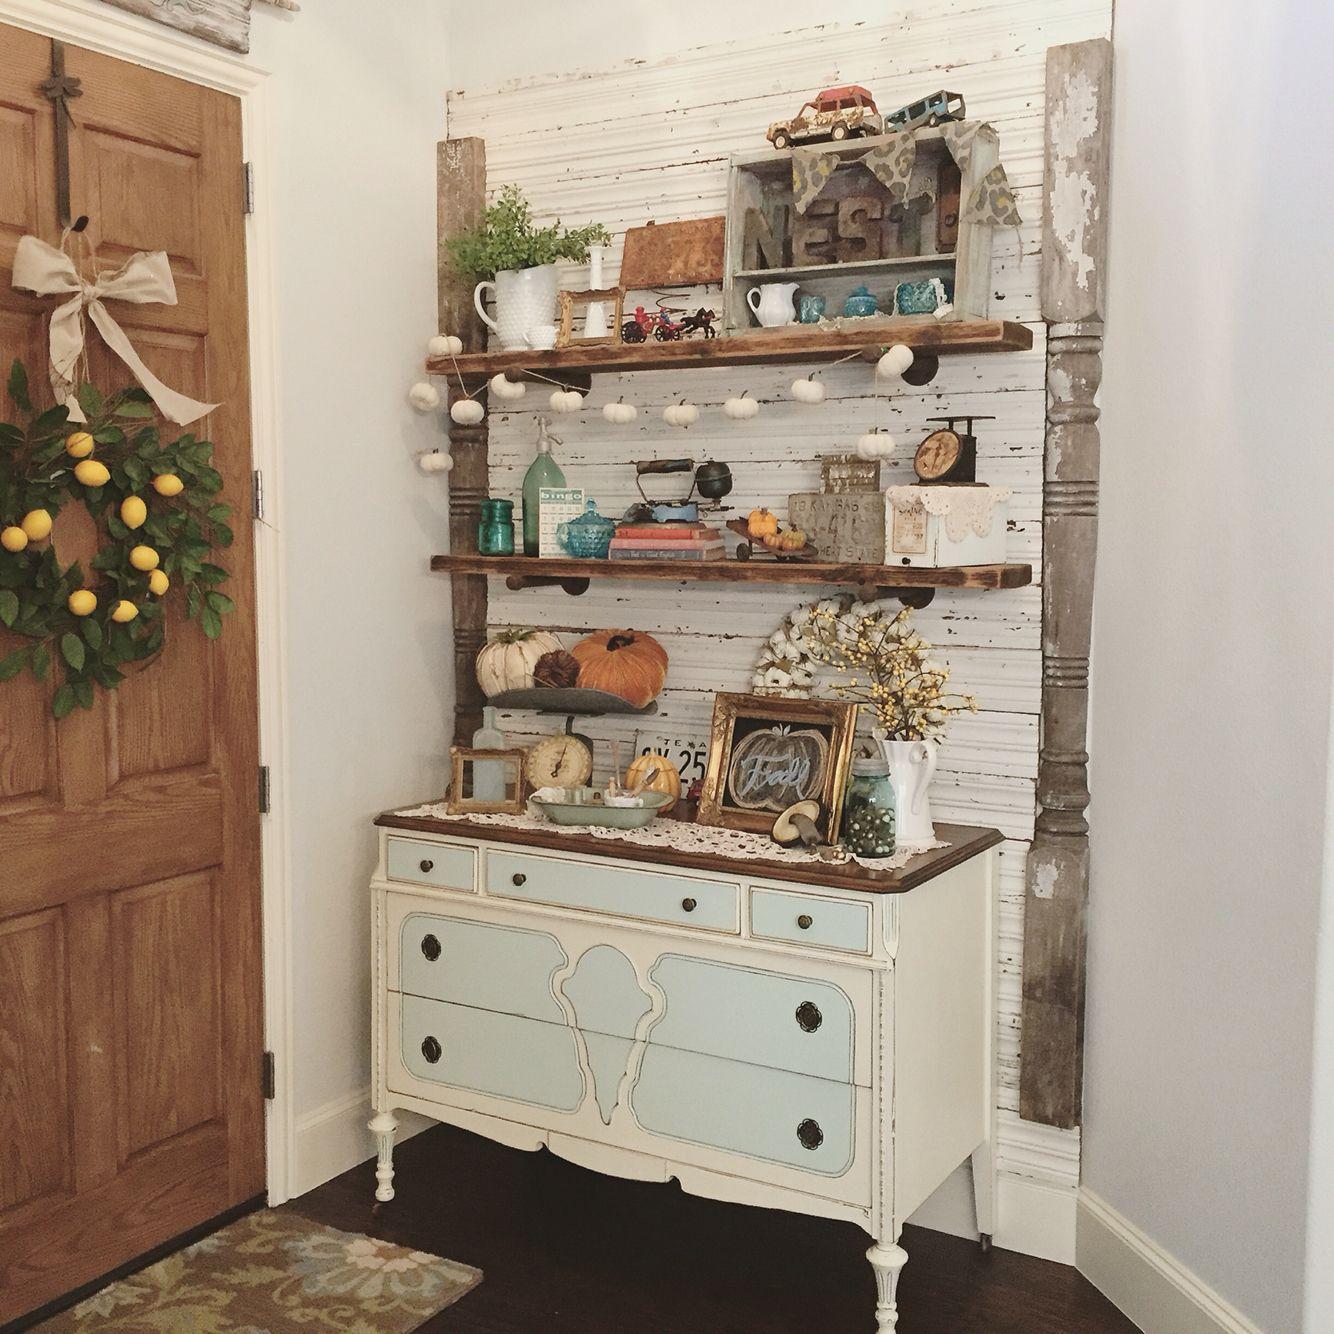 Dresser Drawer Shelves Entry Way Shiplap Wall Repurposed Dresser And Floating Shelves